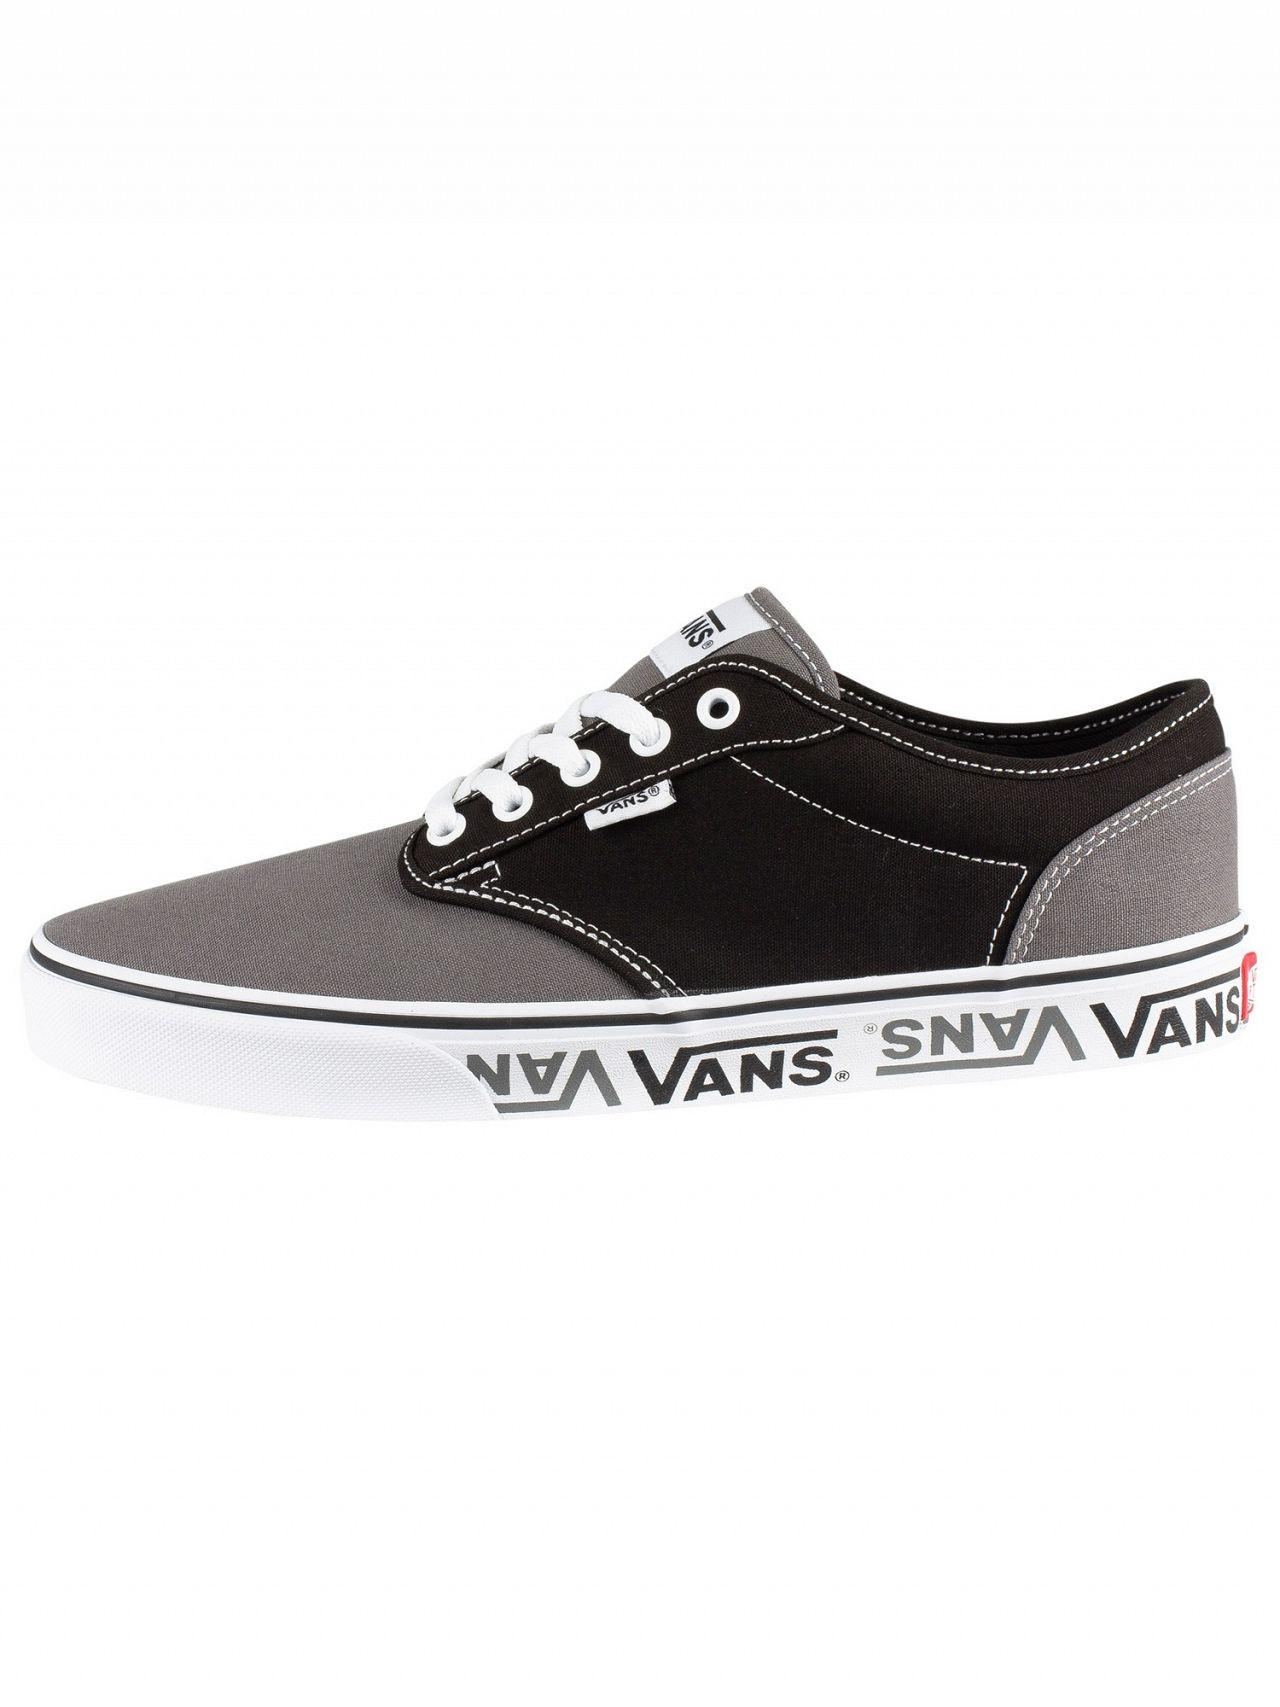 dd99e43e85 Lyst - Vans Black grey Atwood Sidewall Logo Trainers in Black for Men